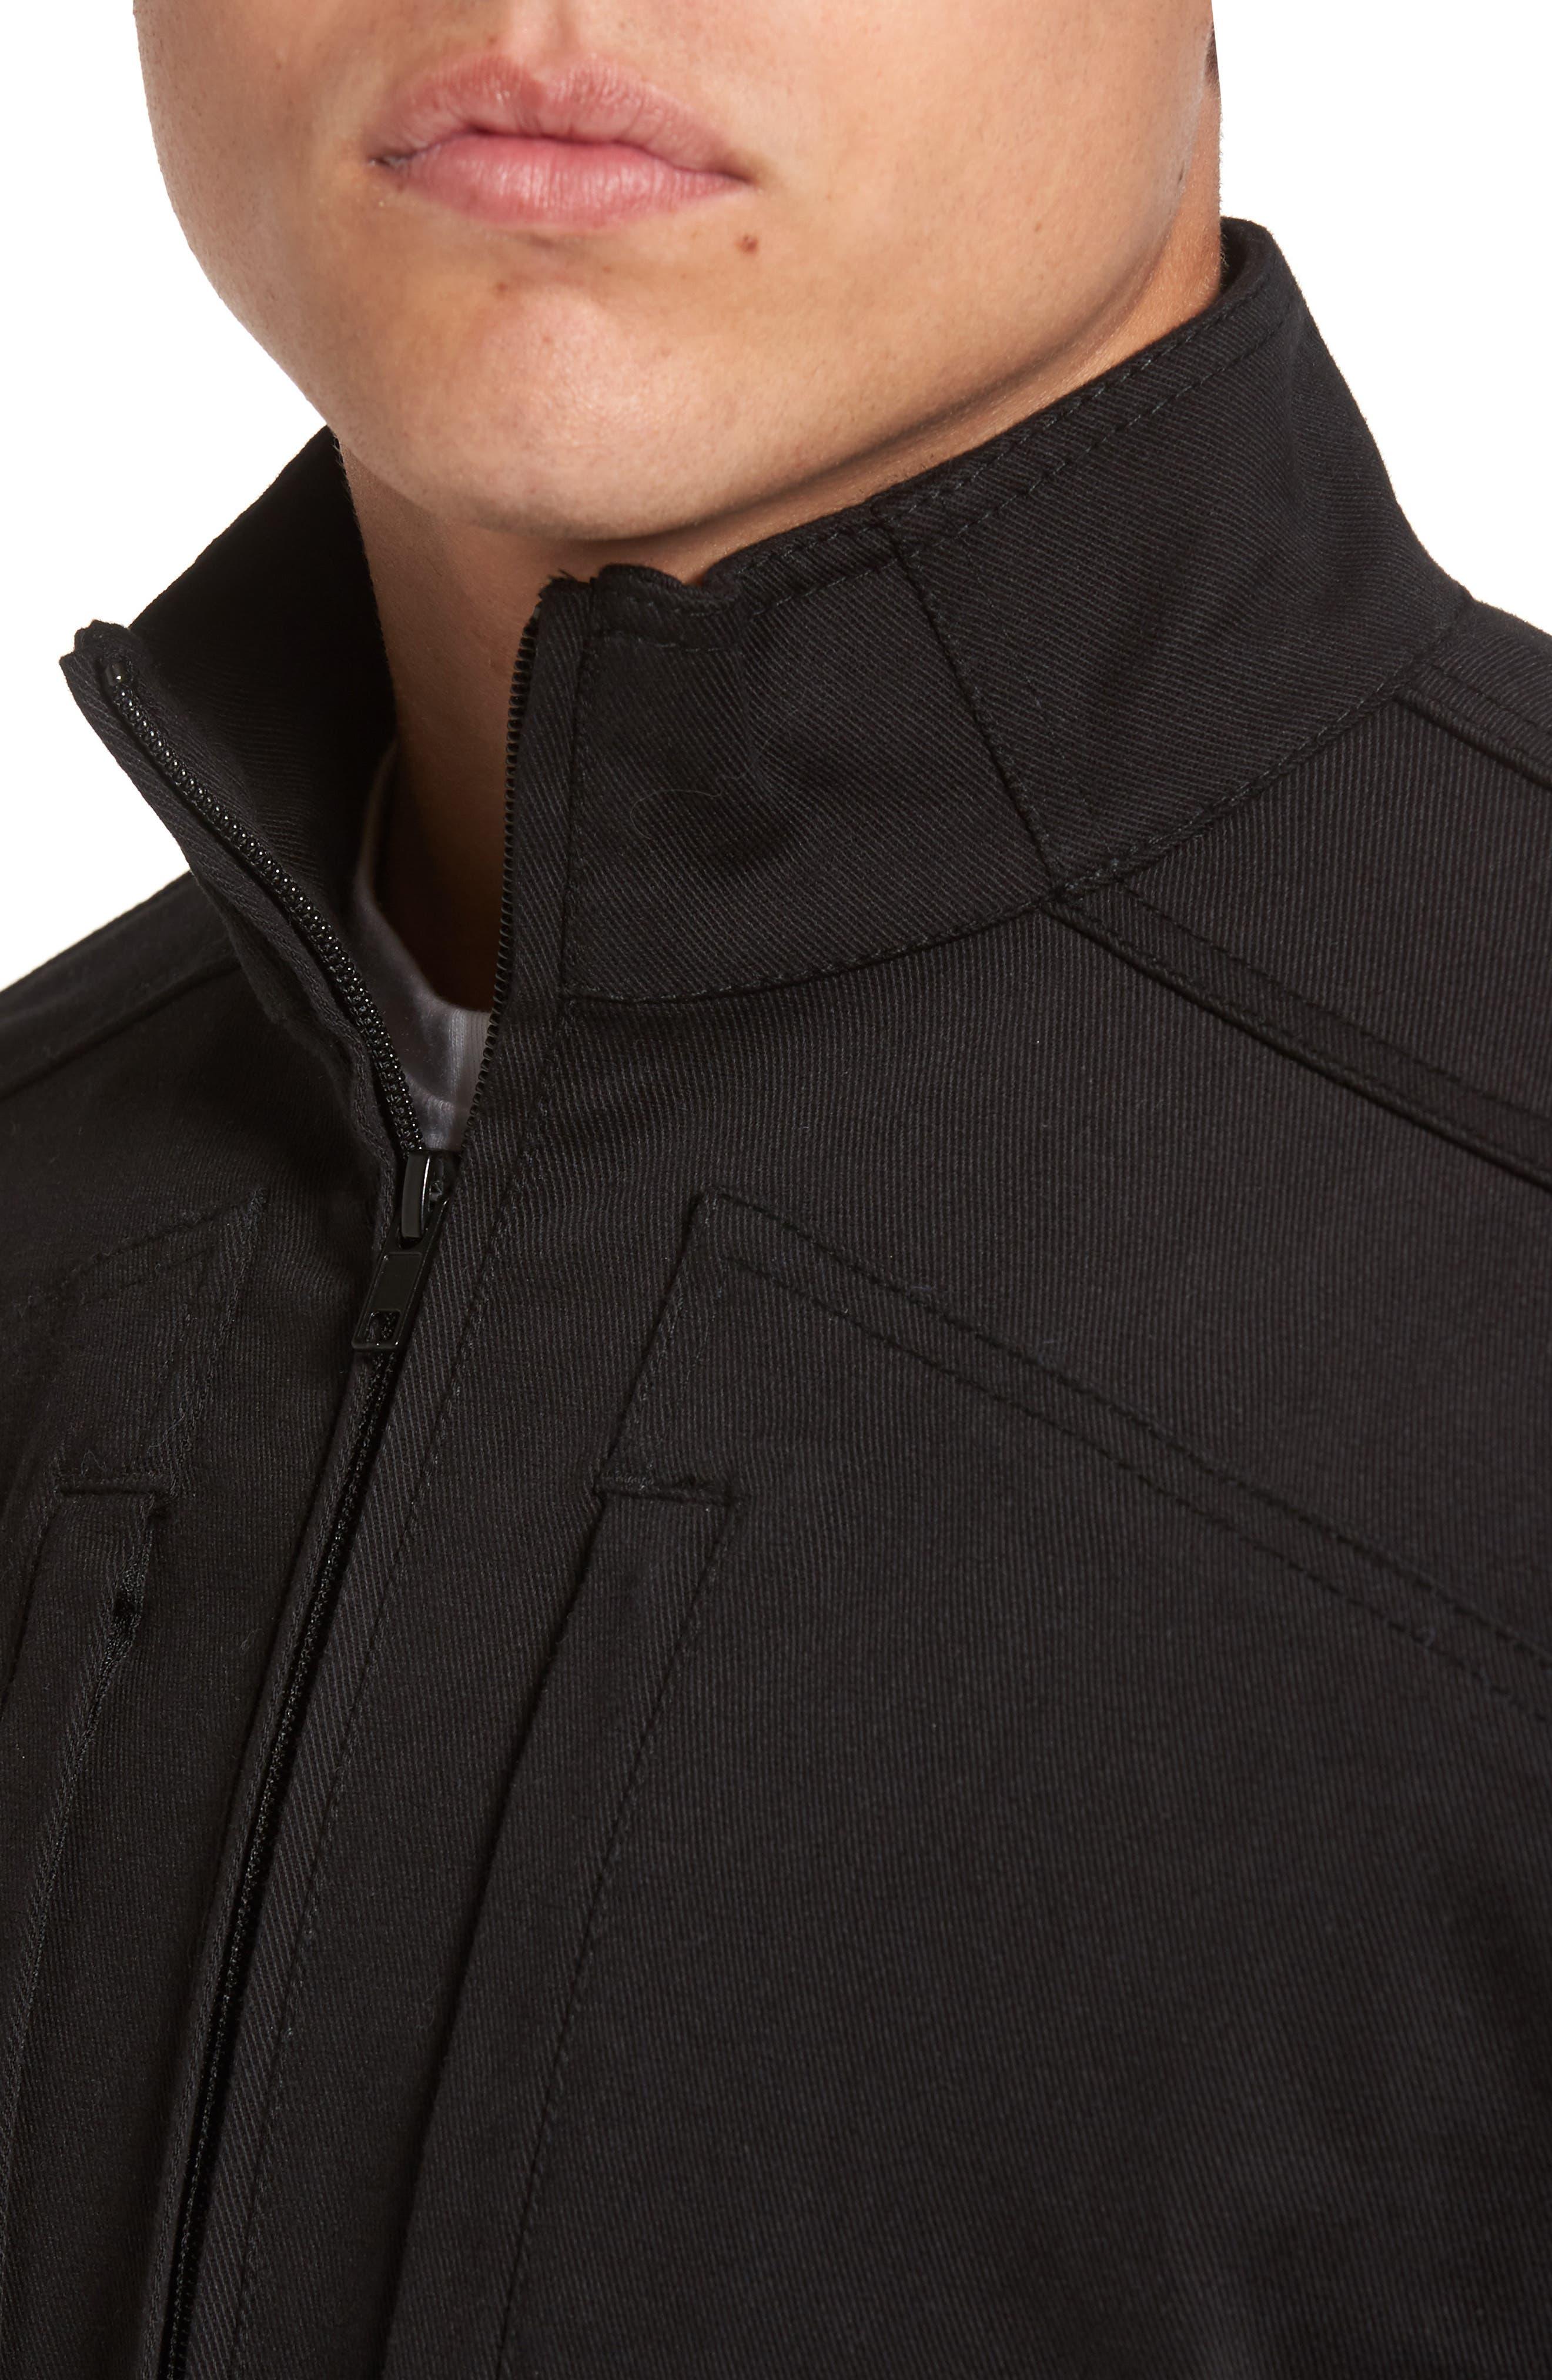 Zip Jacket,                             Alternate thumbnail 4, color,                             001